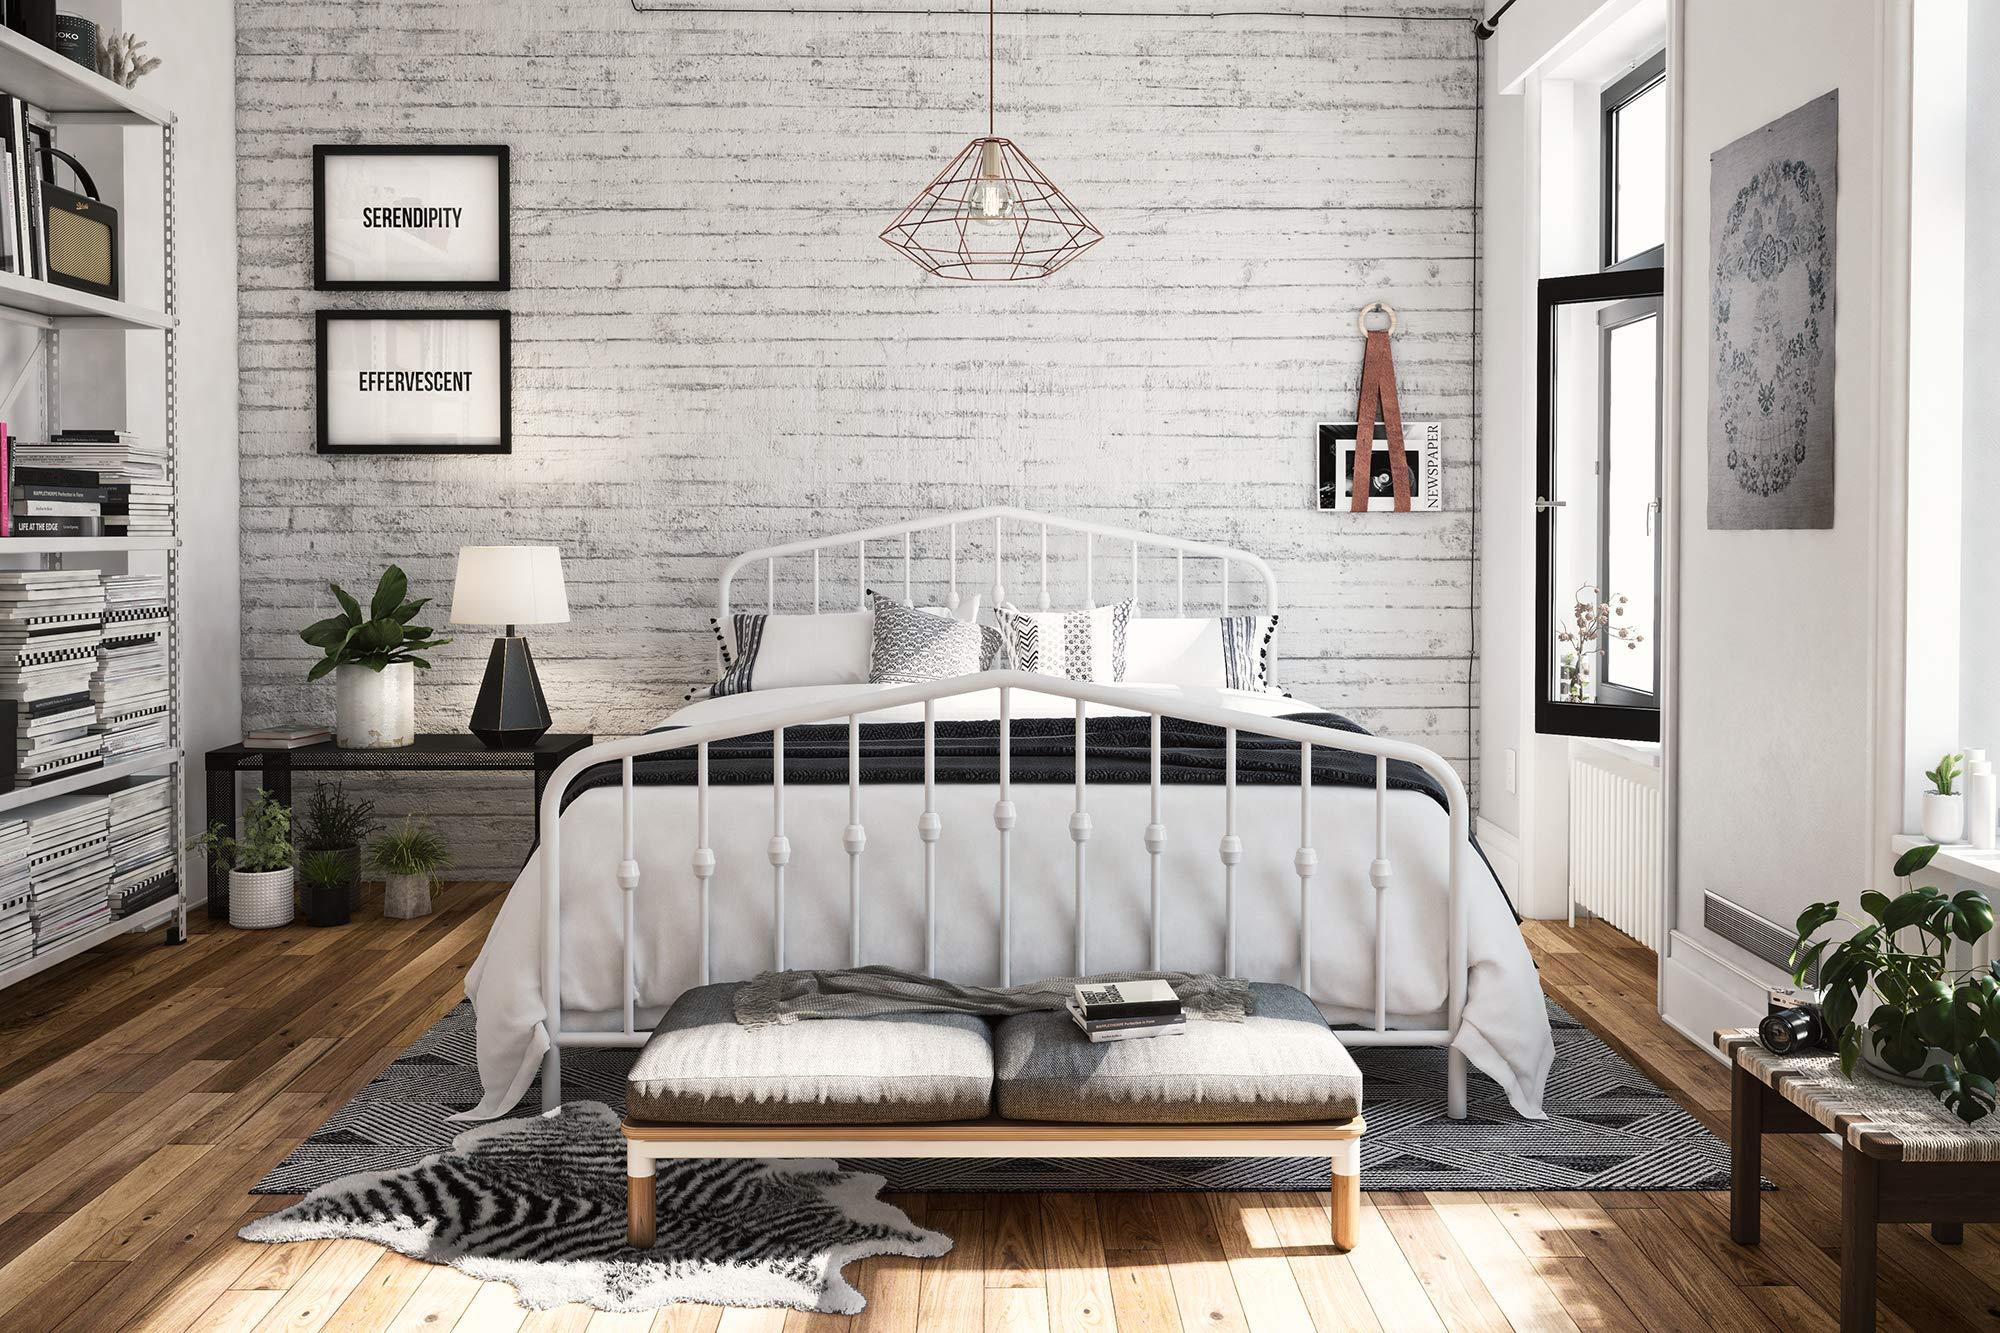 Novogratz Bushwick Metal Bed, Modern Design, Full Size - White by Novogratz